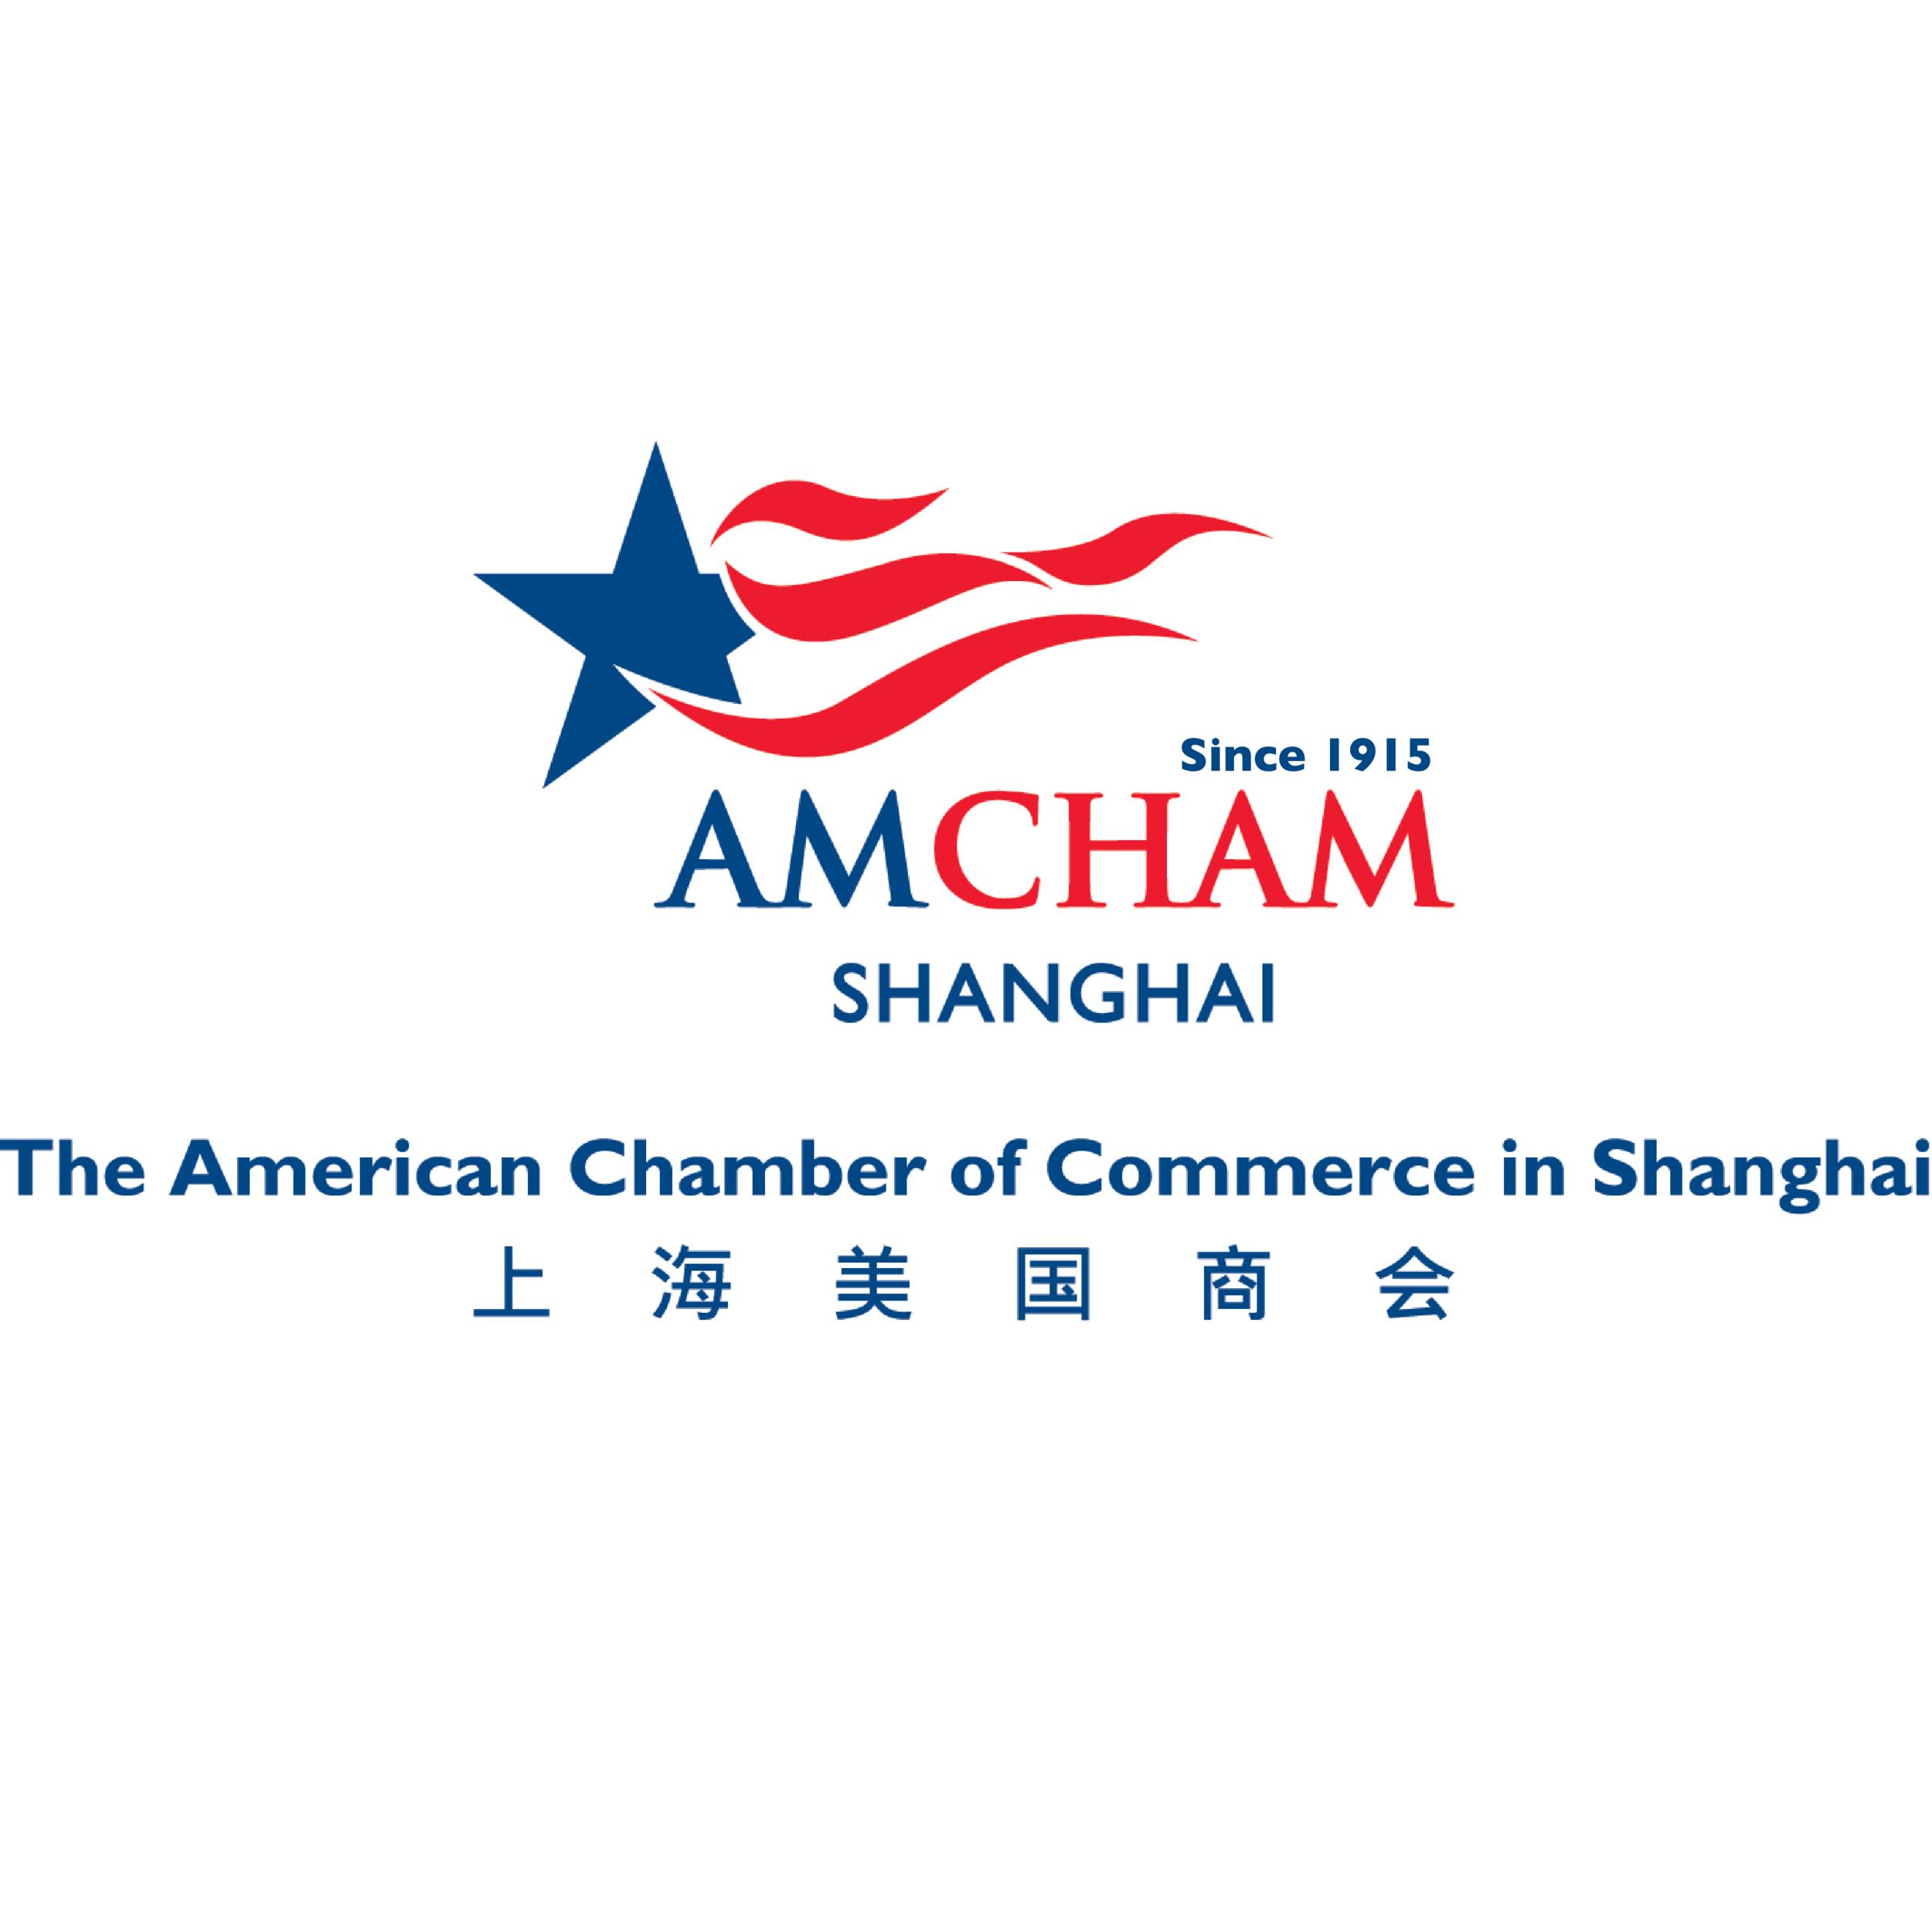 AmCham Shanghai logo 1915 white background-01 - Copy.png